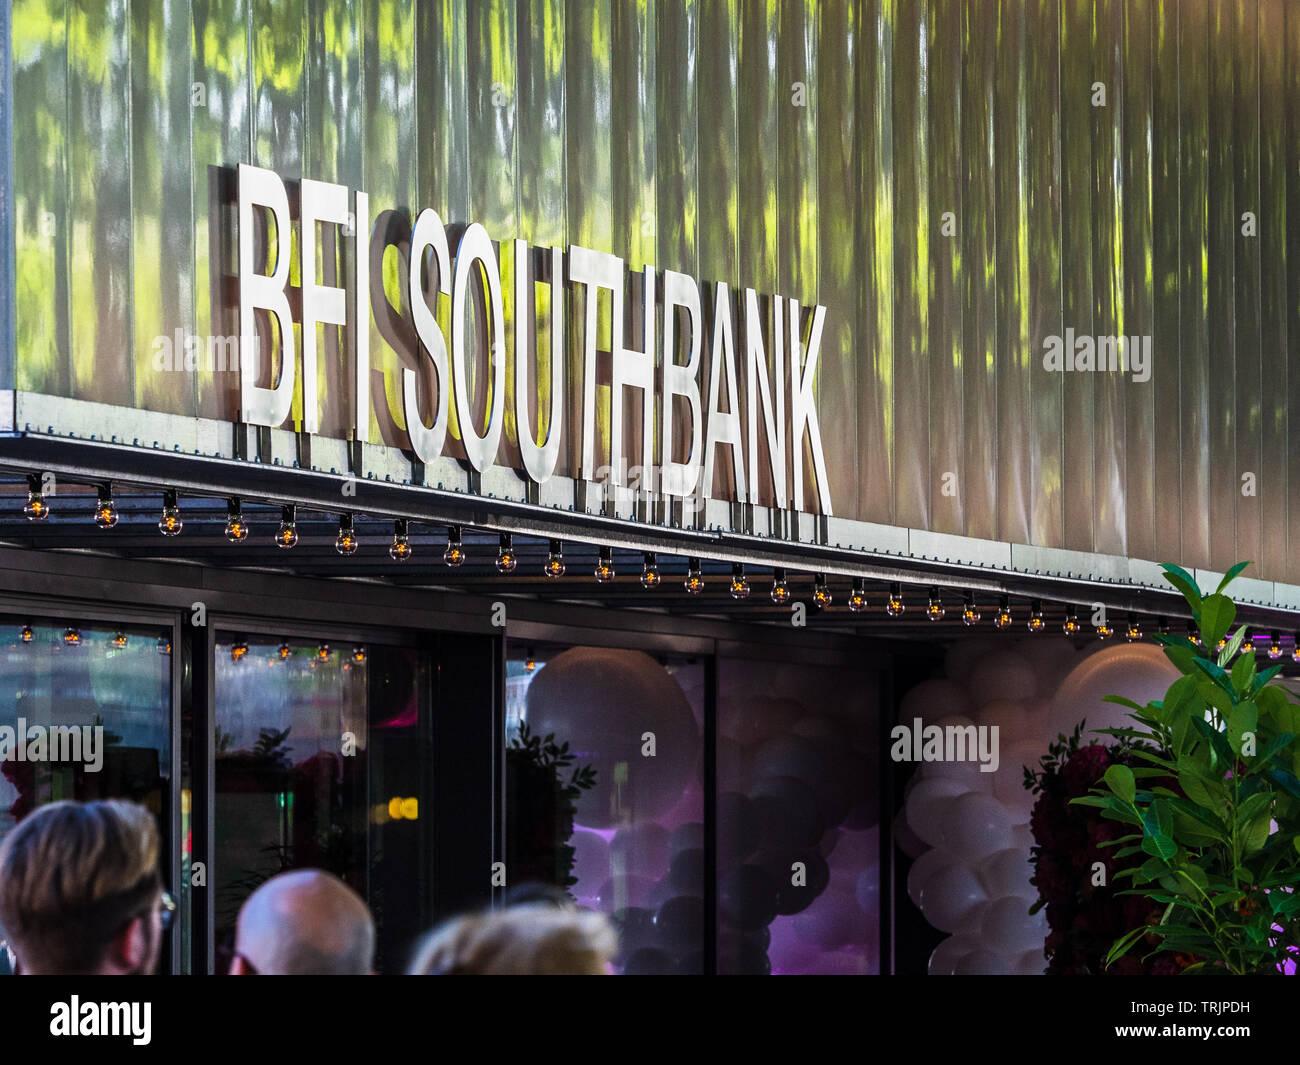 BFI Southbank - der Eingang zur British Film Institute Southbank Kino auf dem Londoner Southbank Komplex Stockbild